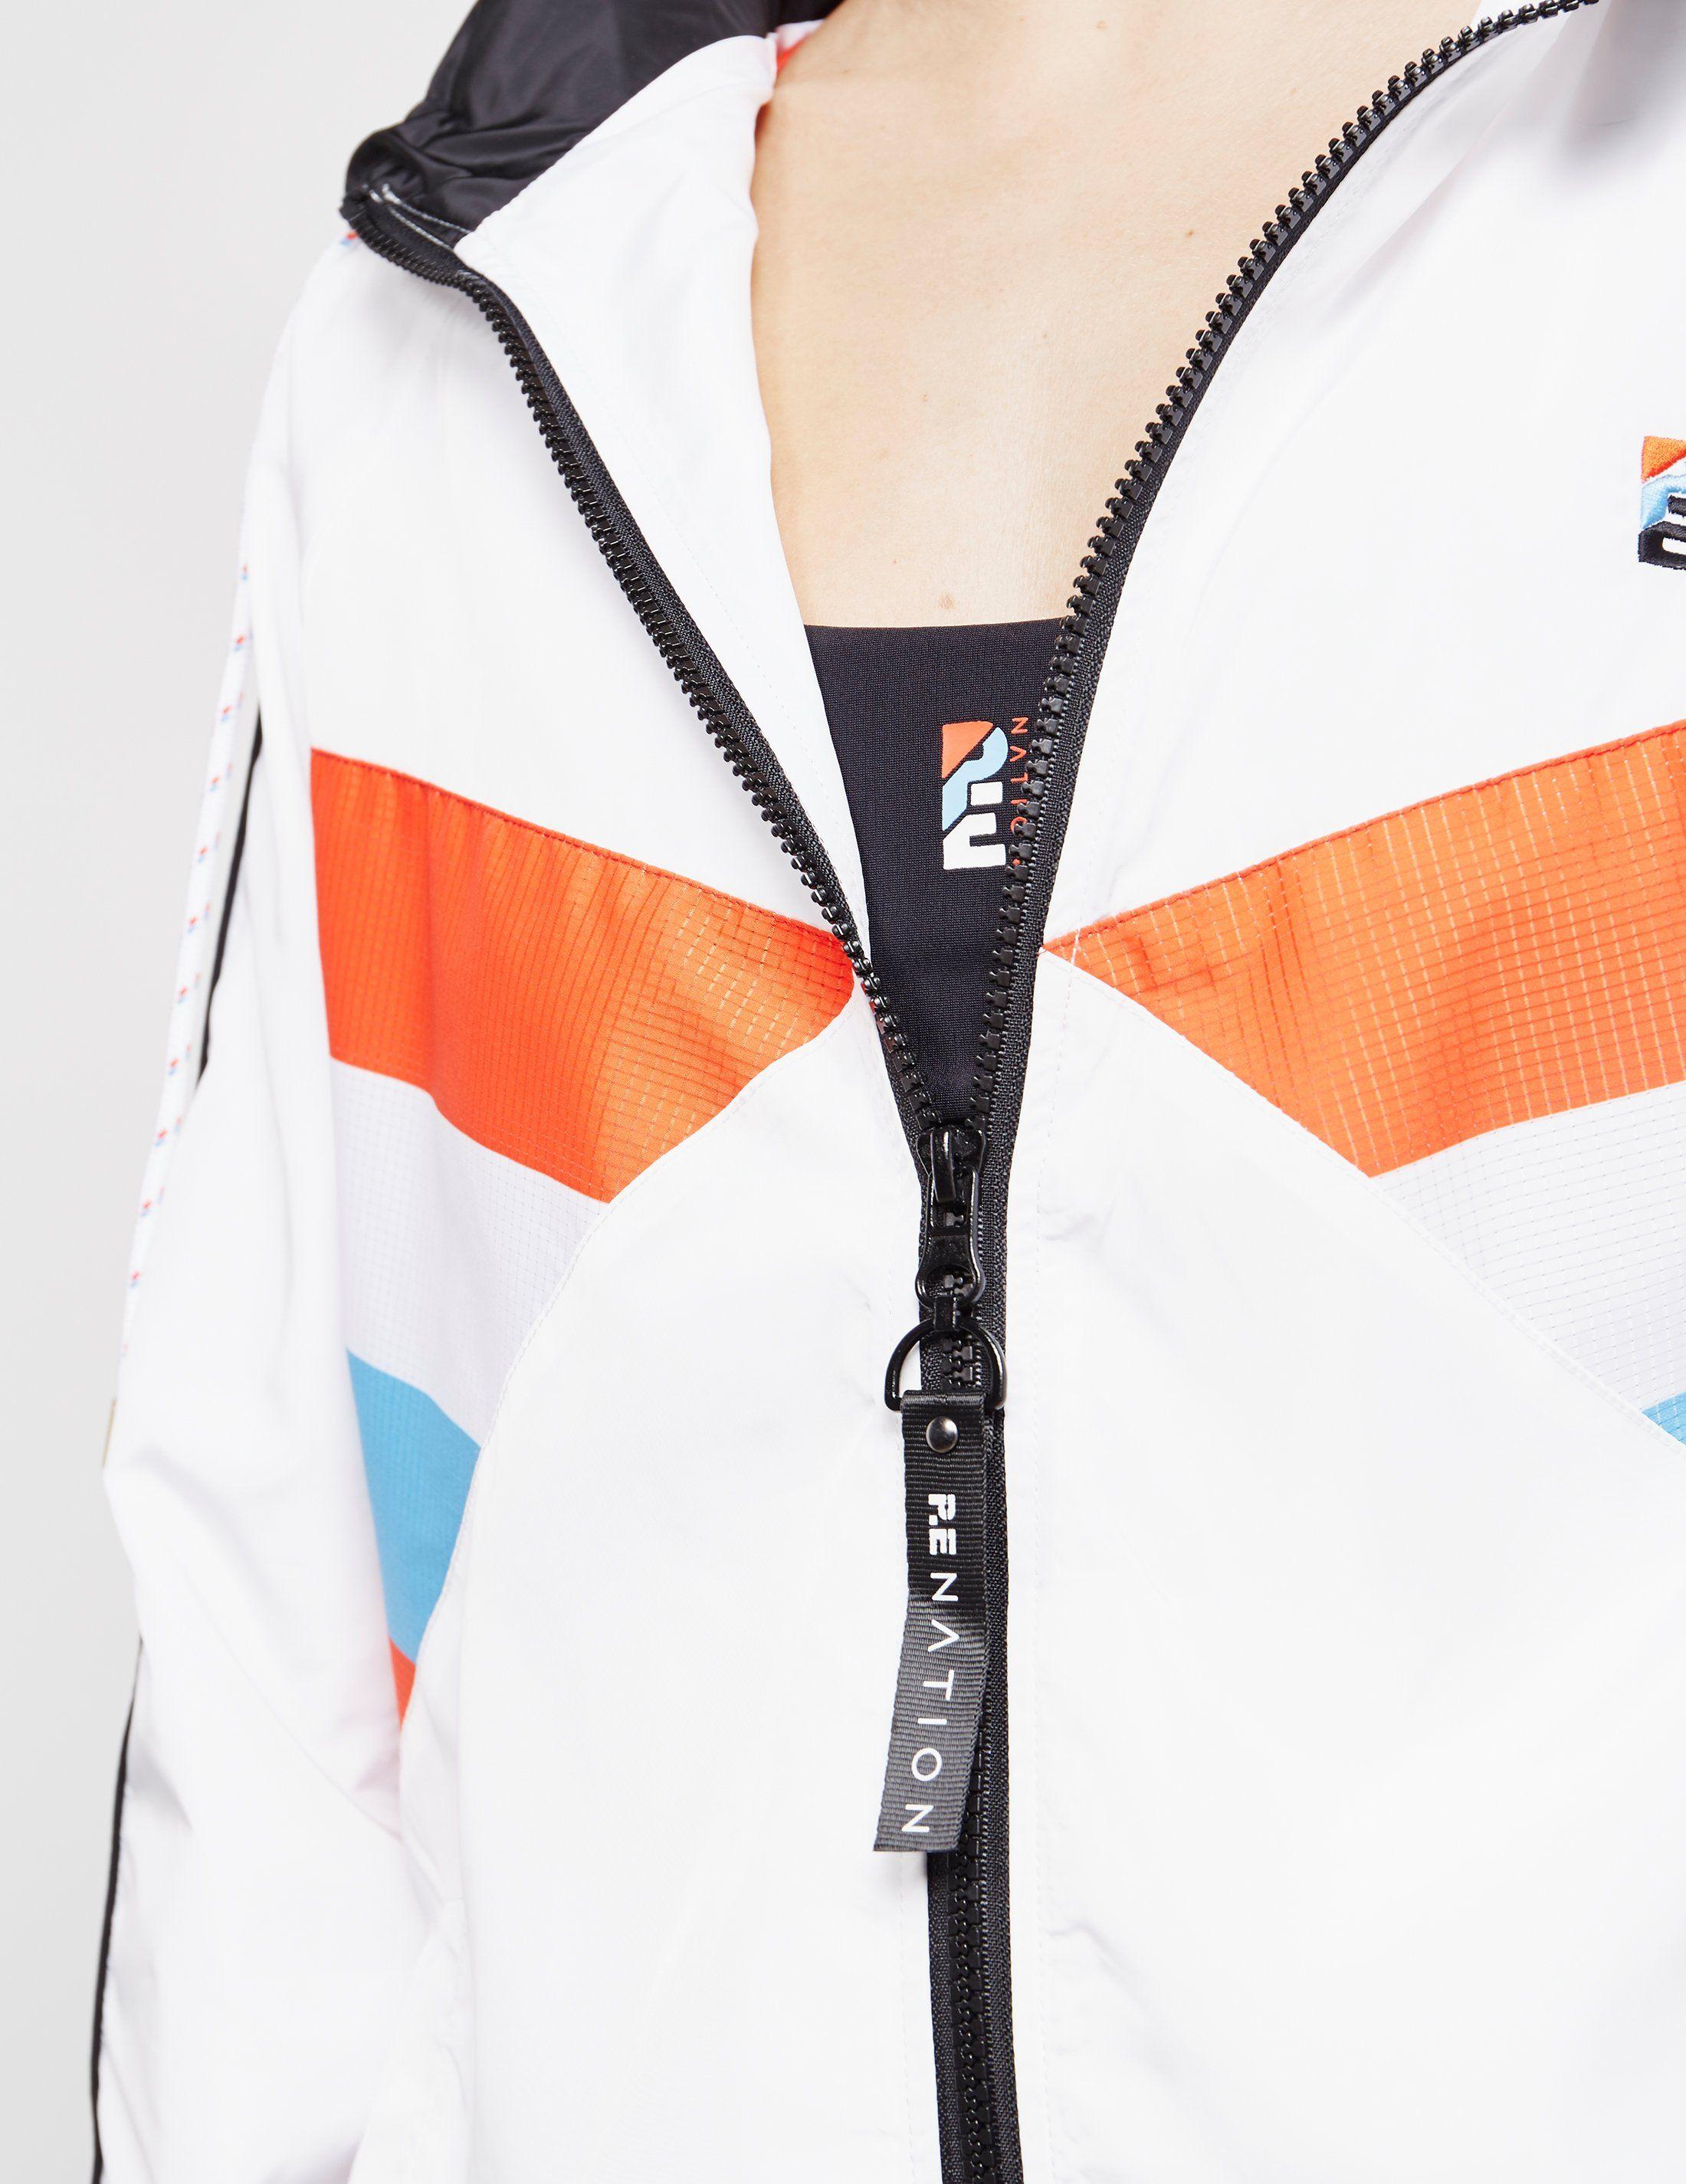 P.E Nation Ruck Panel Jacket